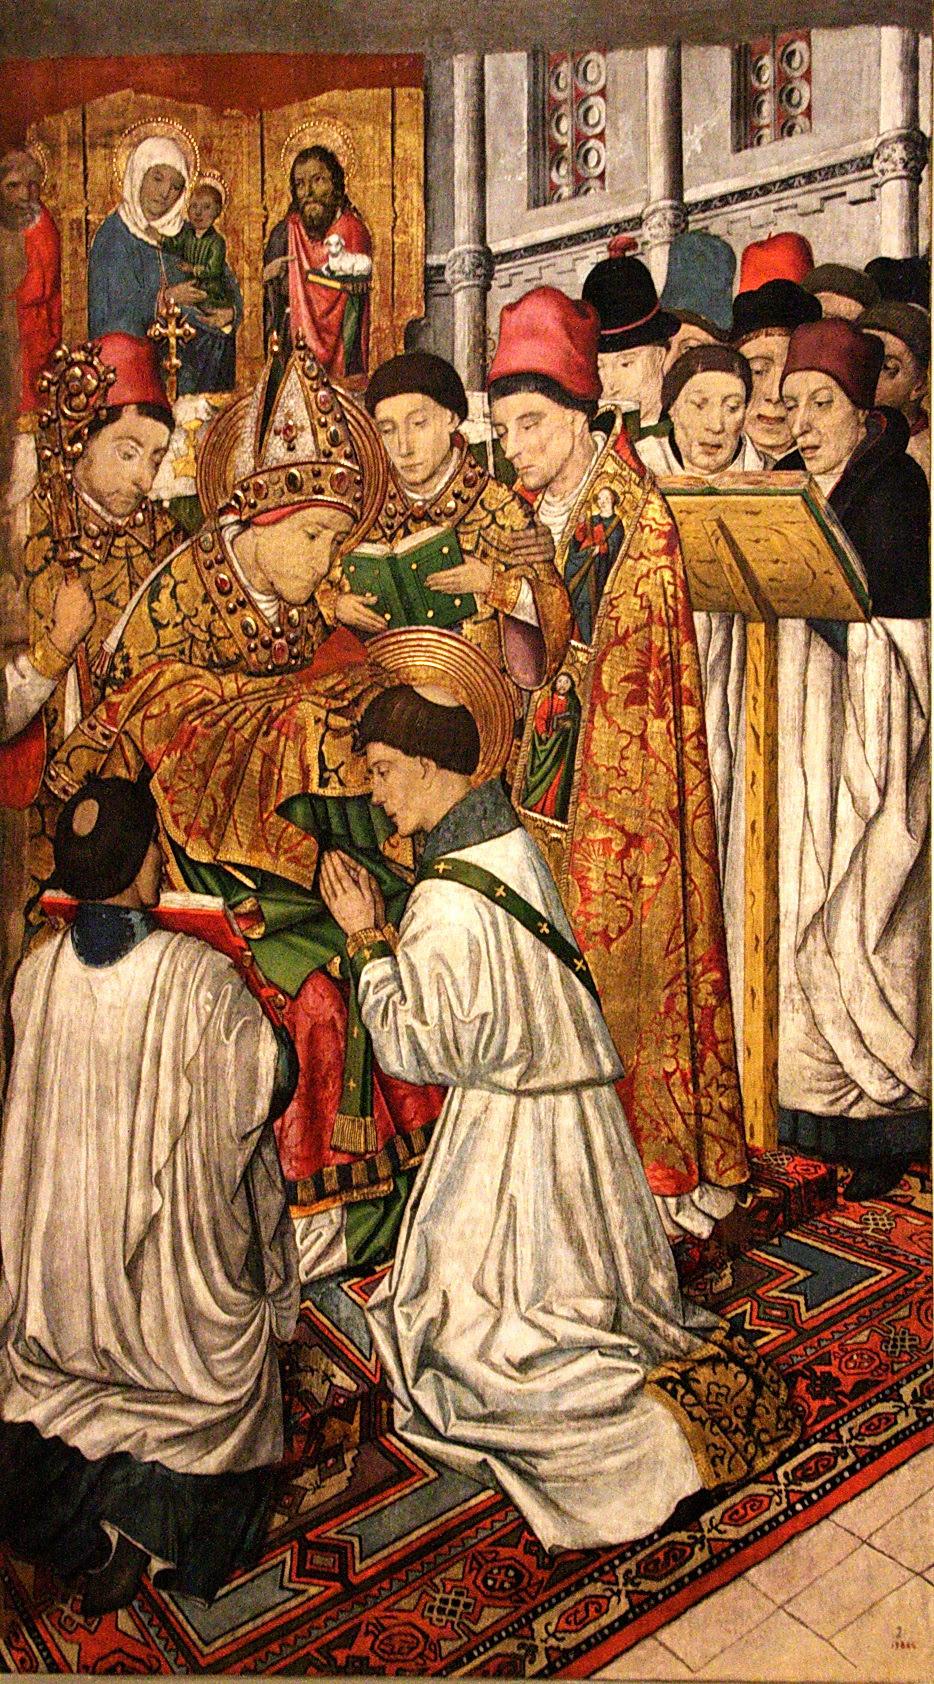 http://upload.wikimedia.org/wikipedia/commons/5/58/JaumeHuguet-RetauleSantVicen%C3%A7-6569.jpg